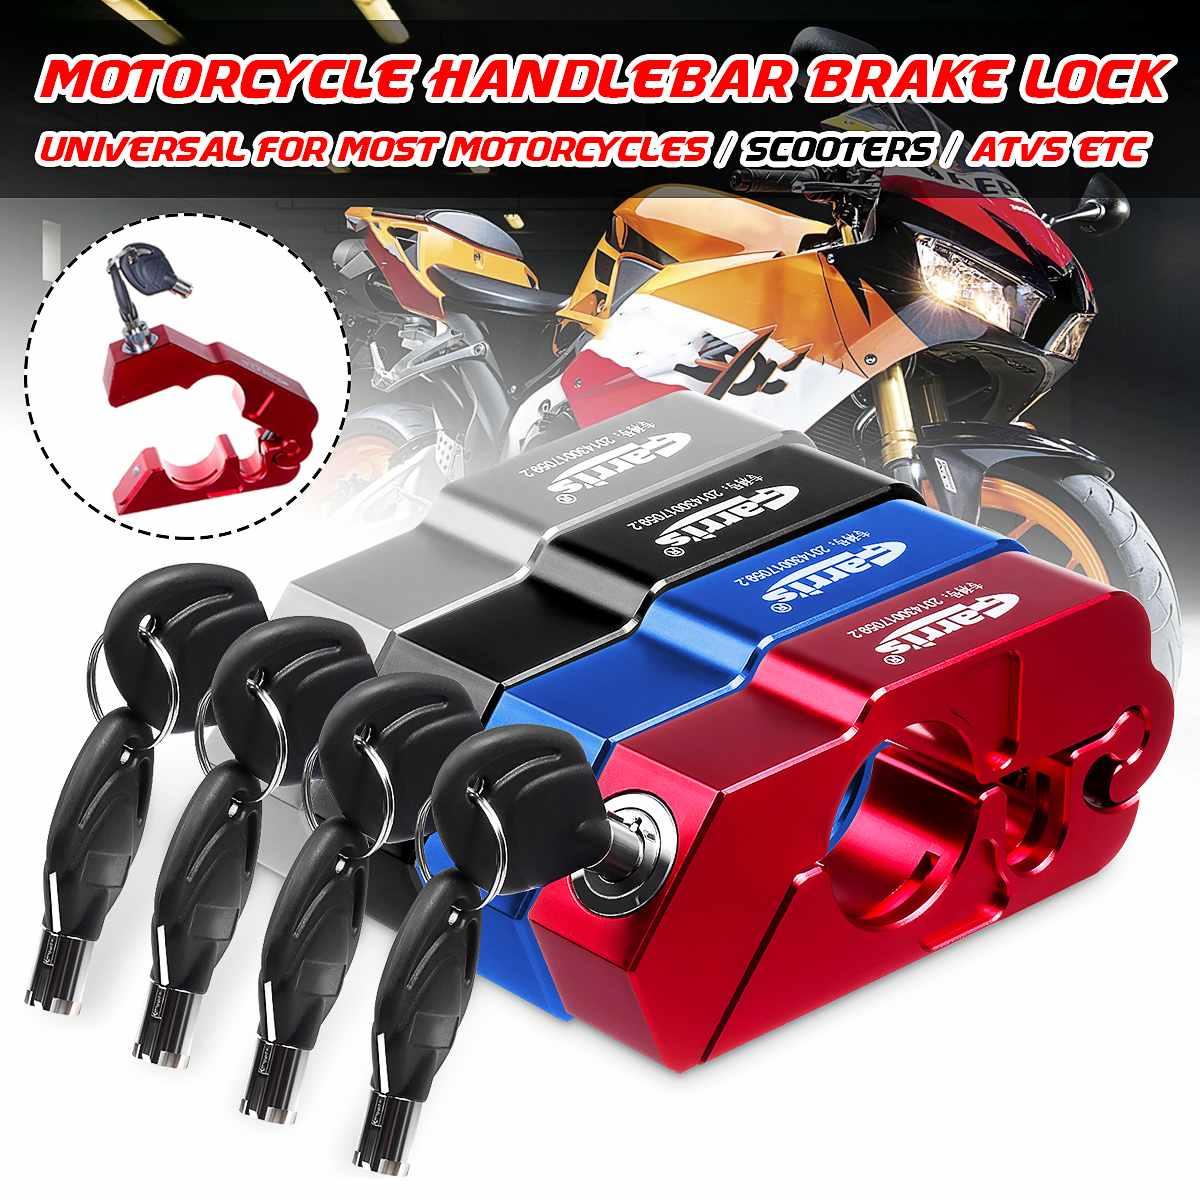 Universal Motorcycle Handle Grip Security Safety Lock Brake Clutch Levers Anti Theft Locks For Kawasaki For Honda For Yamaha ATV